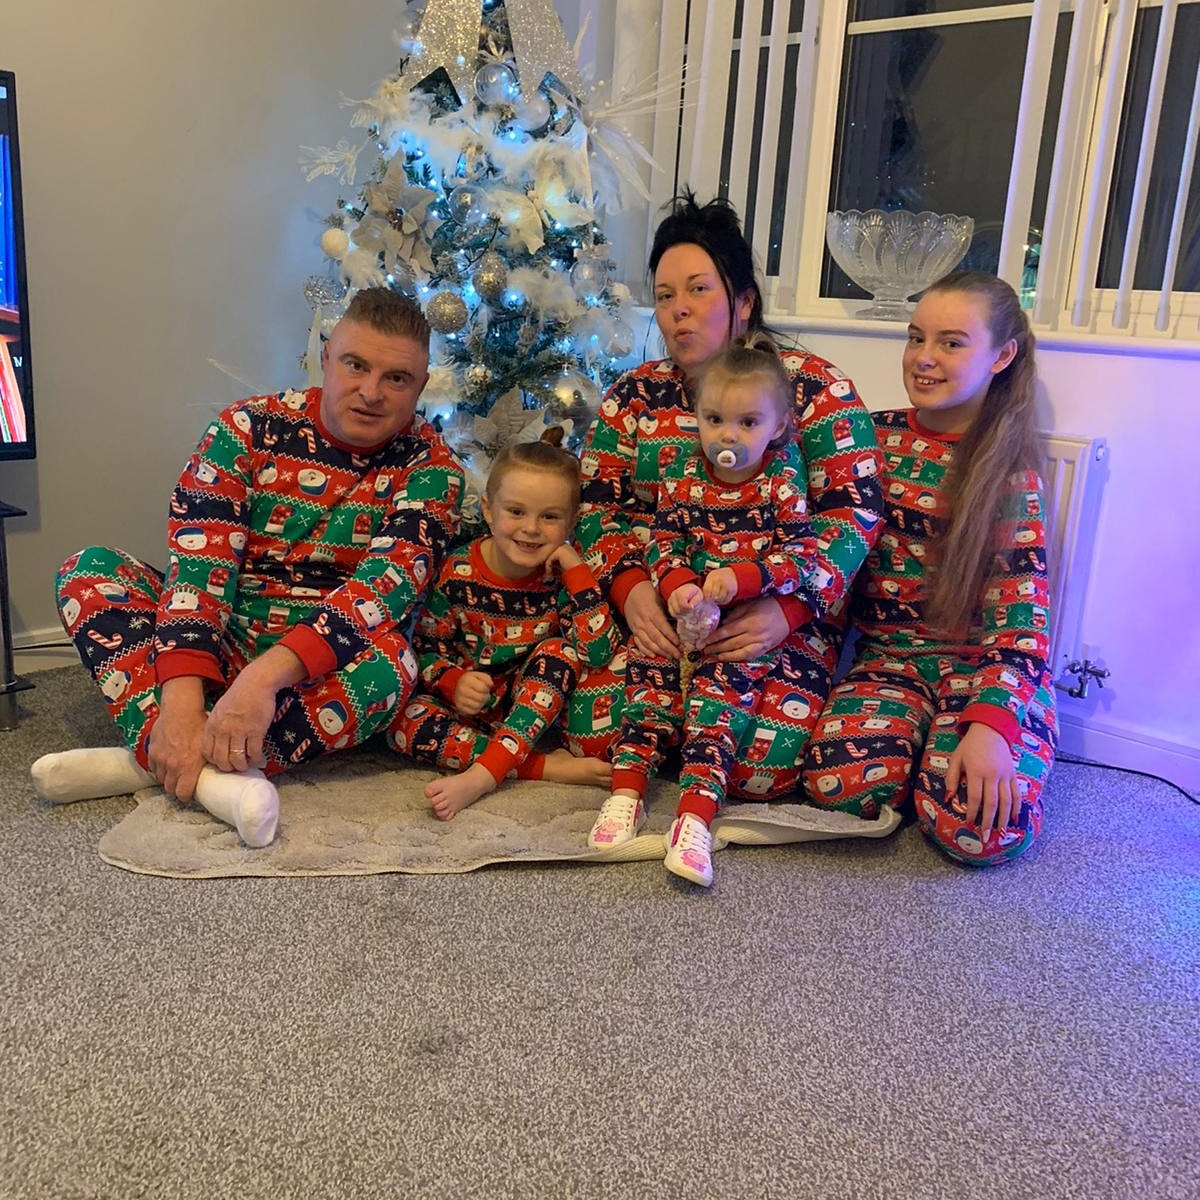 Merry Christmas everyone 🎅